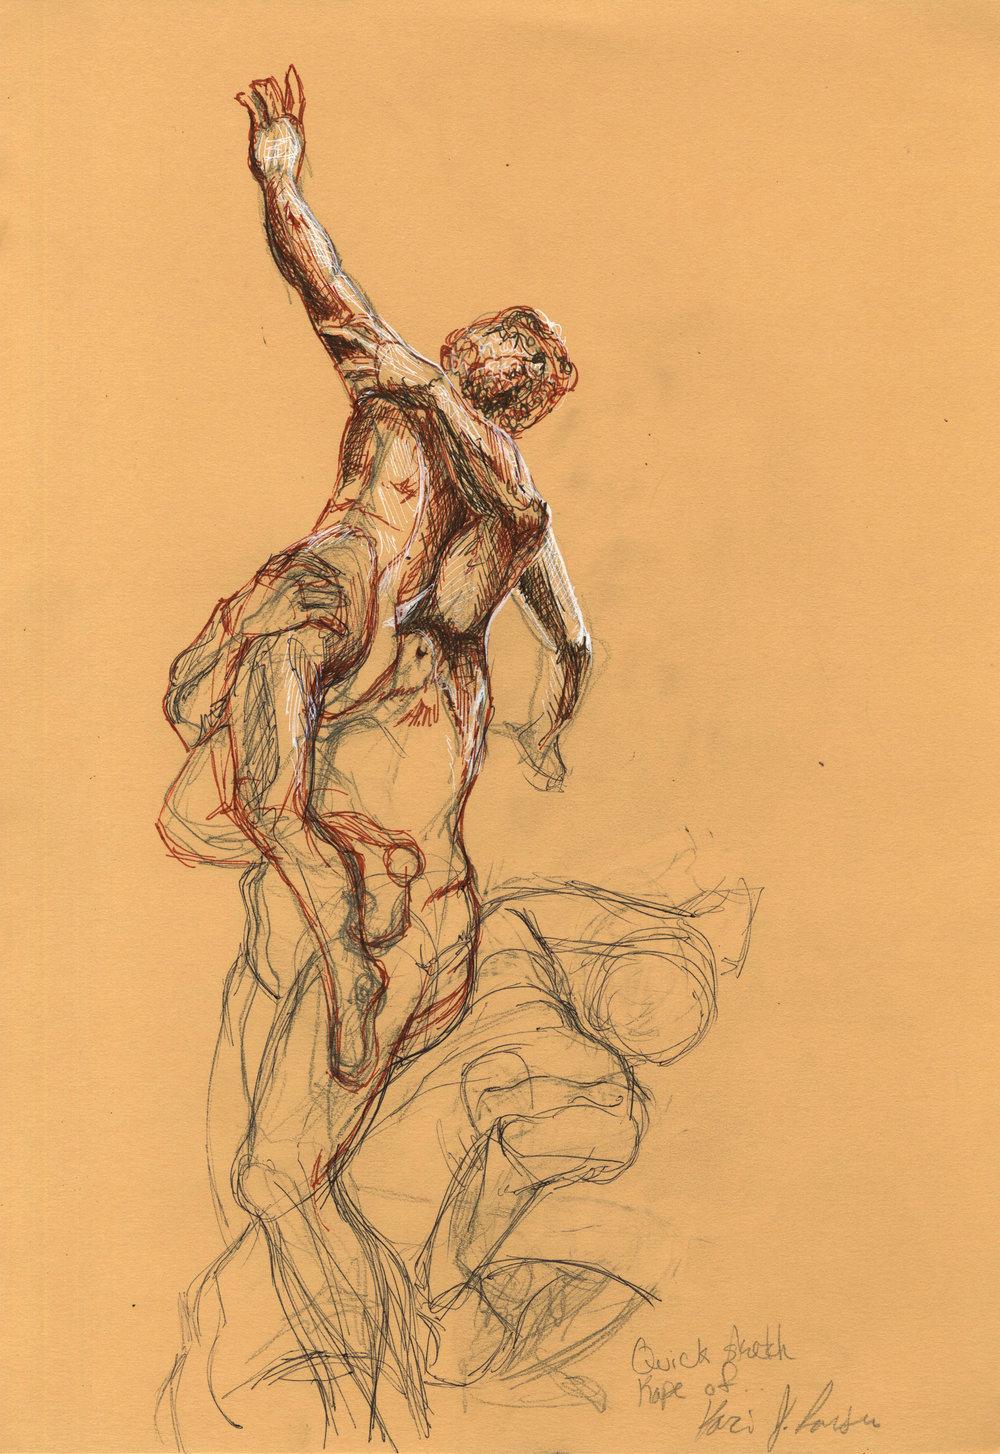 The Rape of Persephone